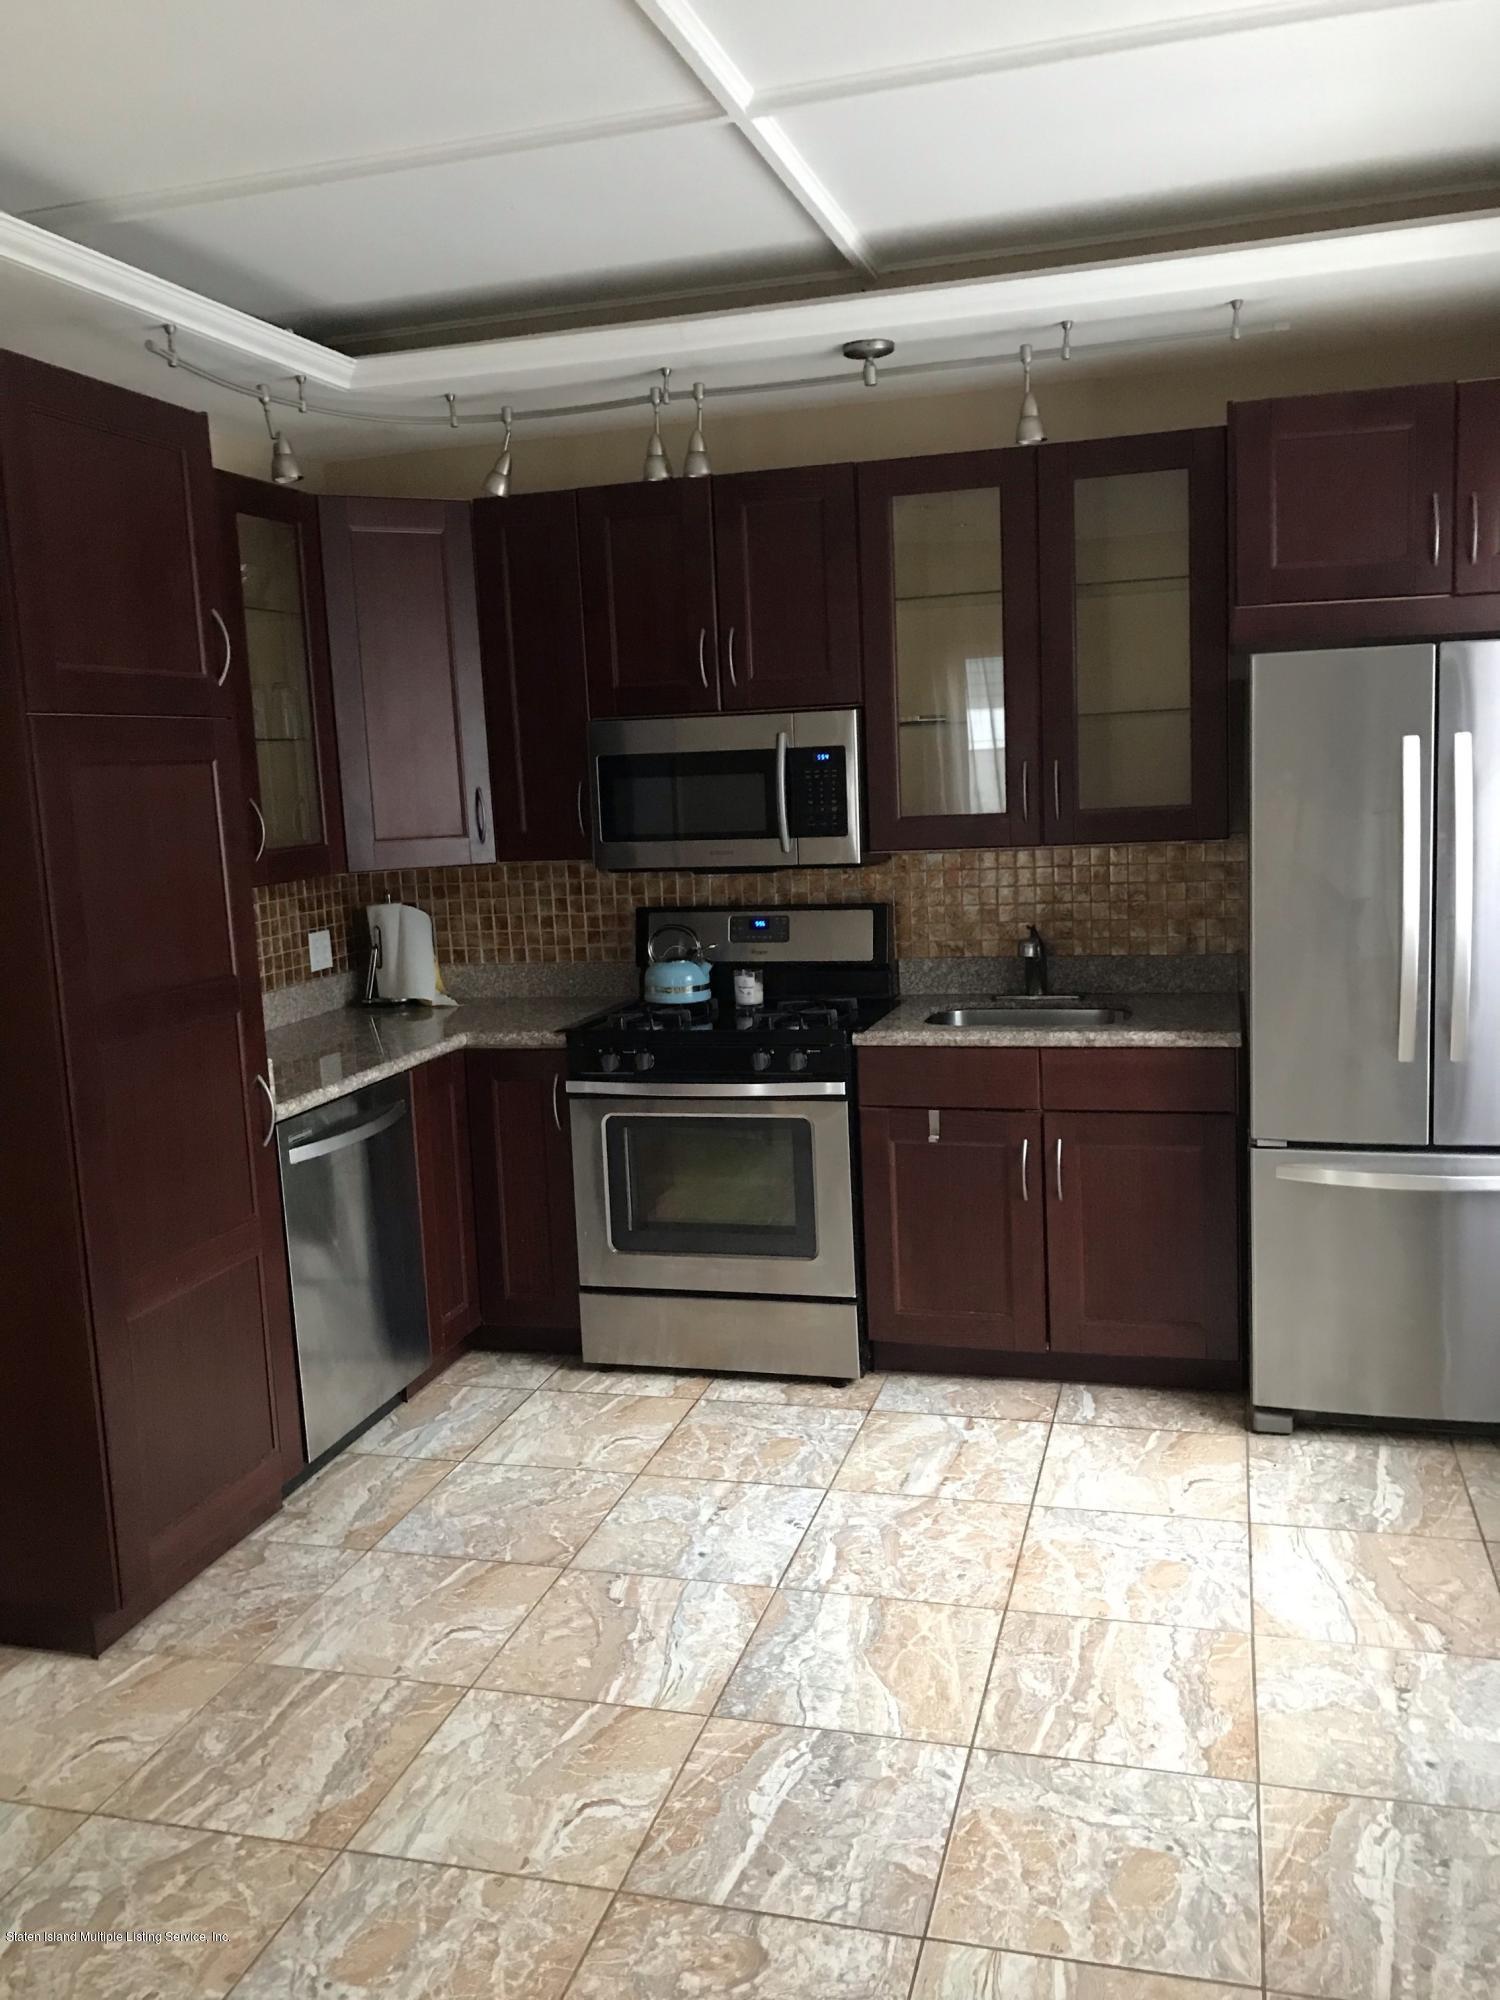 Single Family - Detached 241 Wiman Avenue  Staten Island, NY 10308, MLS-1129646-4